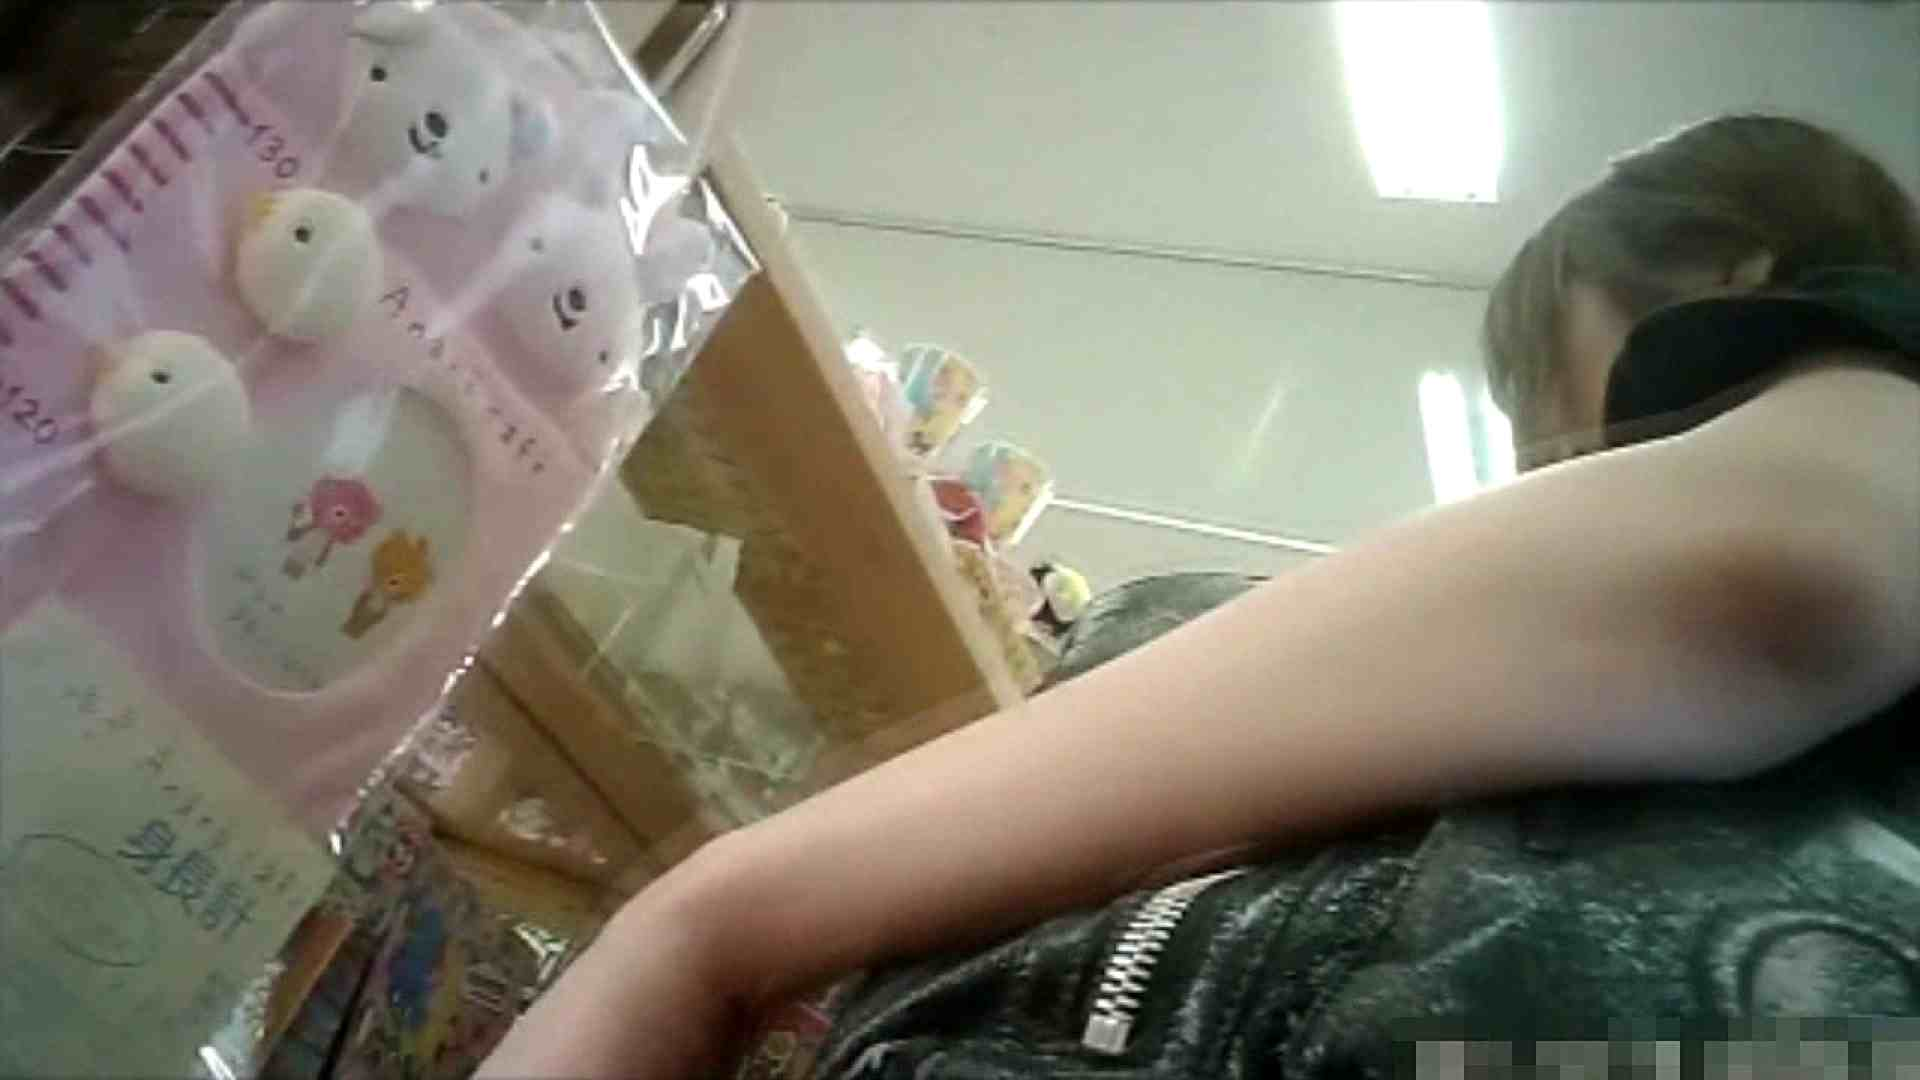 NO.6 雑貨屋で買い物中のガーリーな女の子 チラ  100連発 38